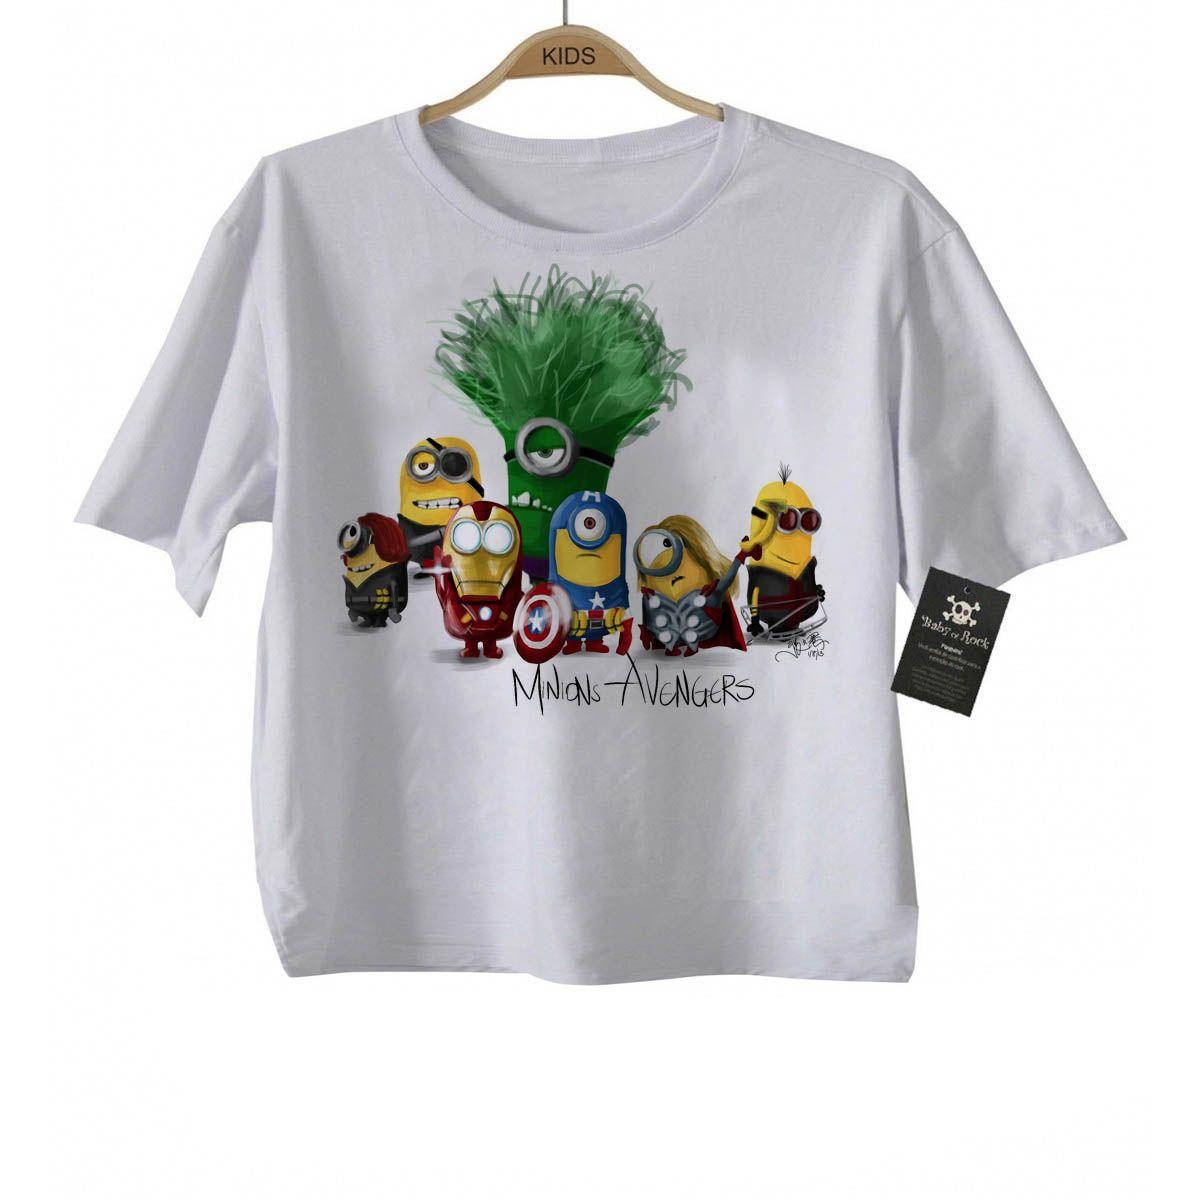 Camiseta infantil    os Vingadores Minions  - White  - Baby Monster - Body Bebe